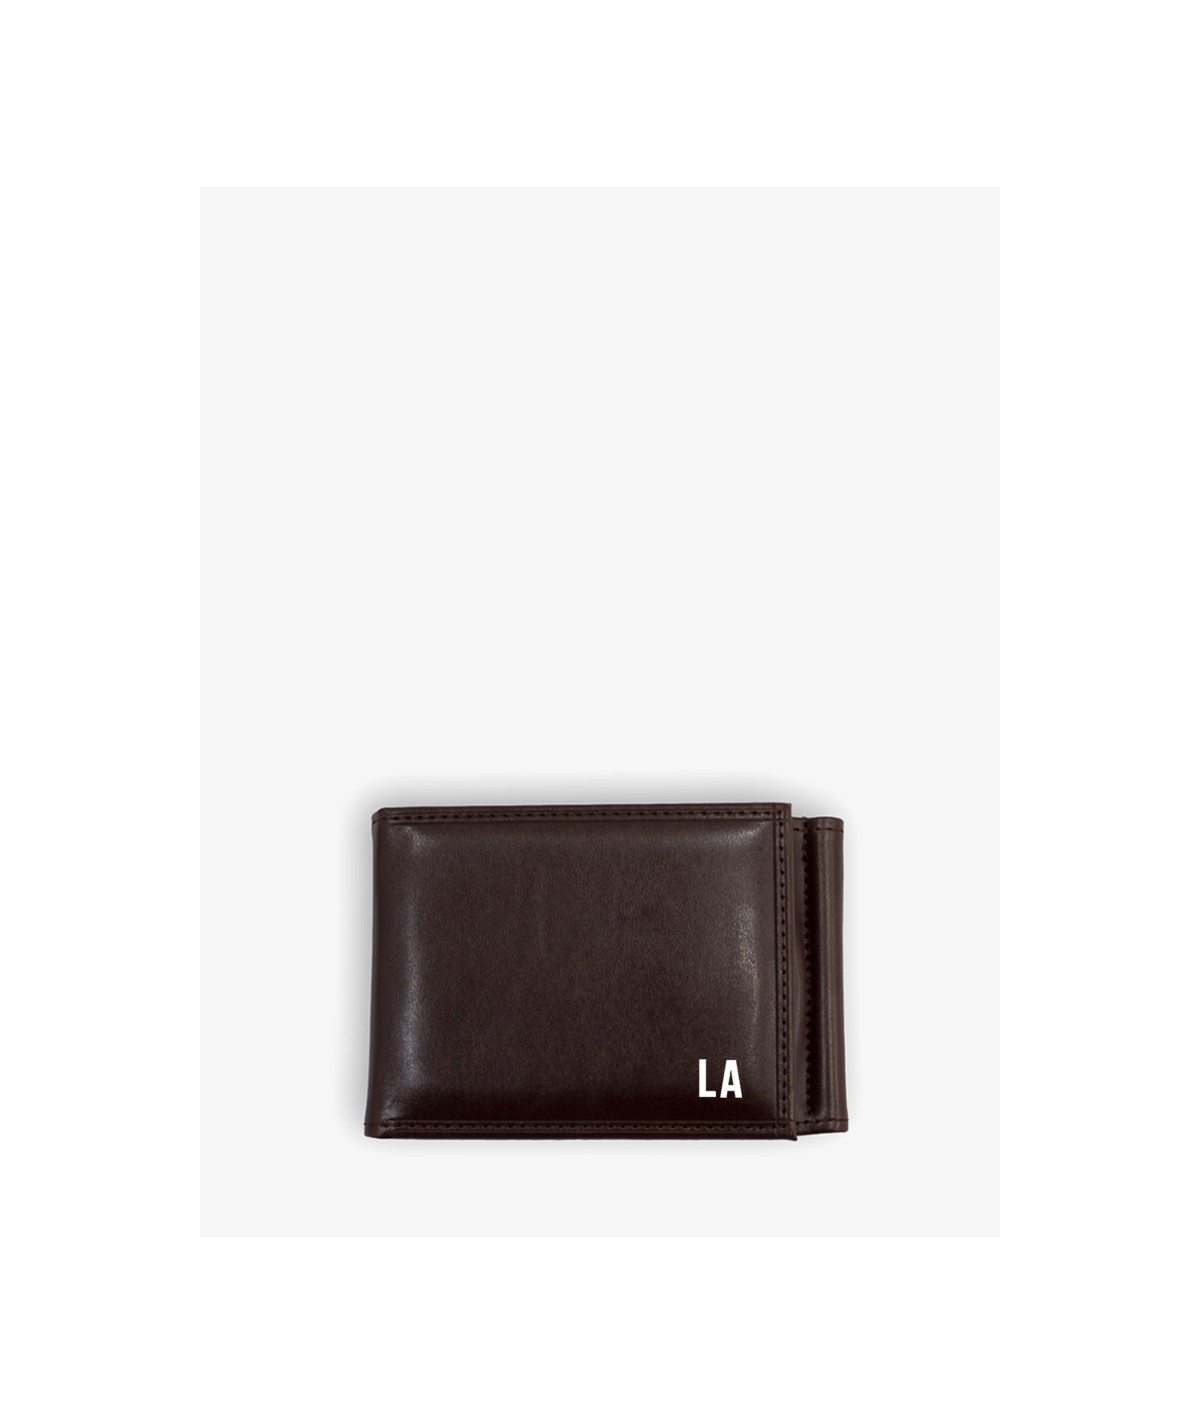 American wallet